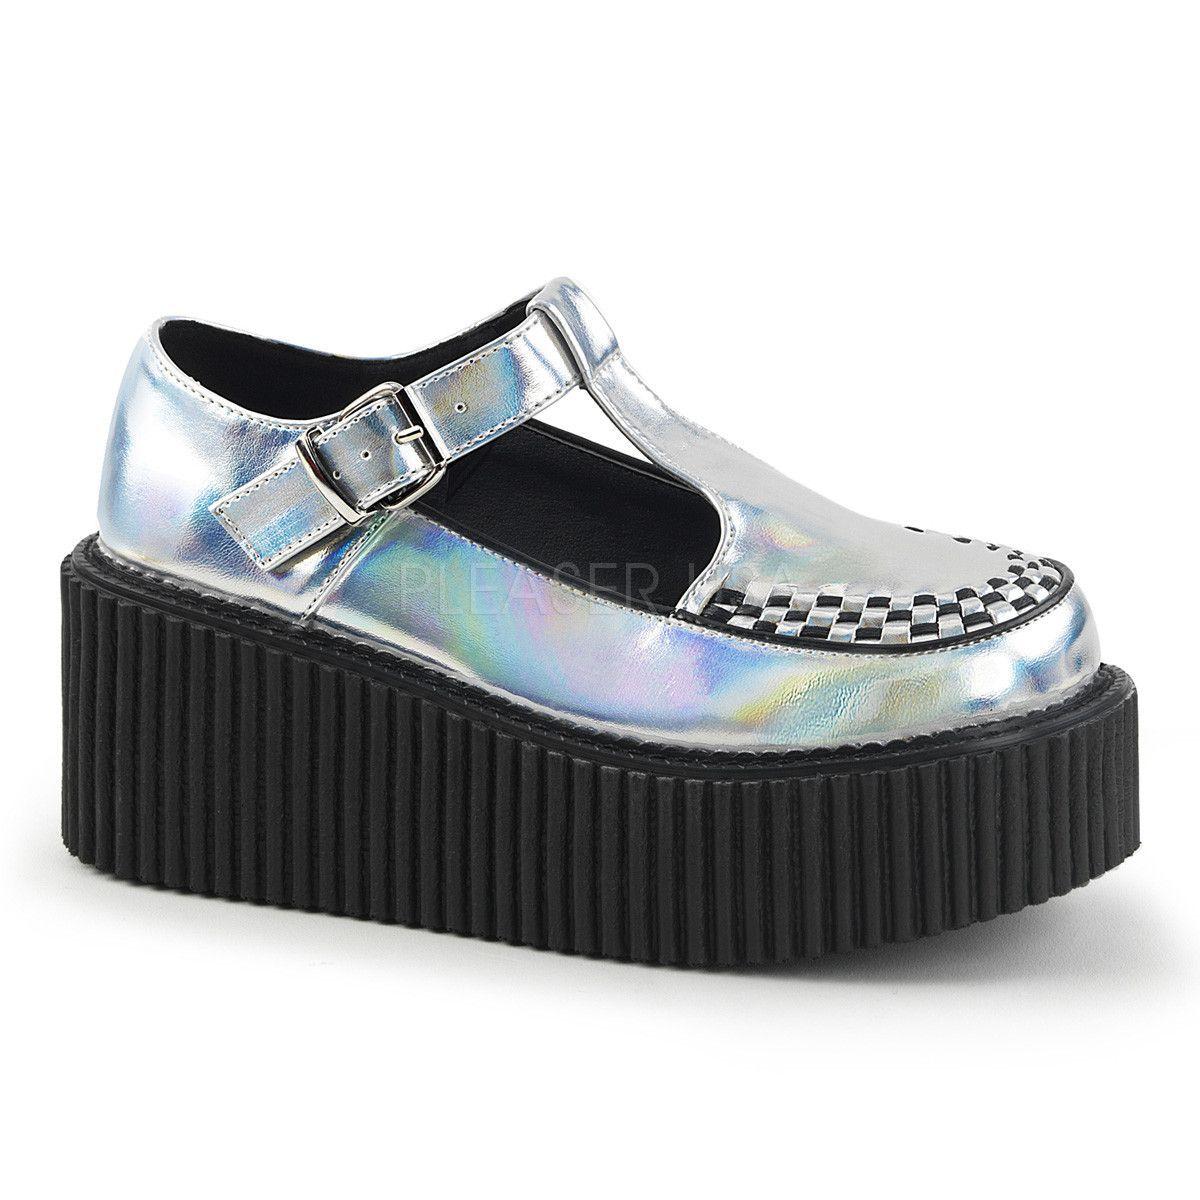 e928f0060e1 Demonia CREEPER-214 has a 3-inch platform T-strap silver hologram patent creeper  shoes with side cutout and interwoven apron